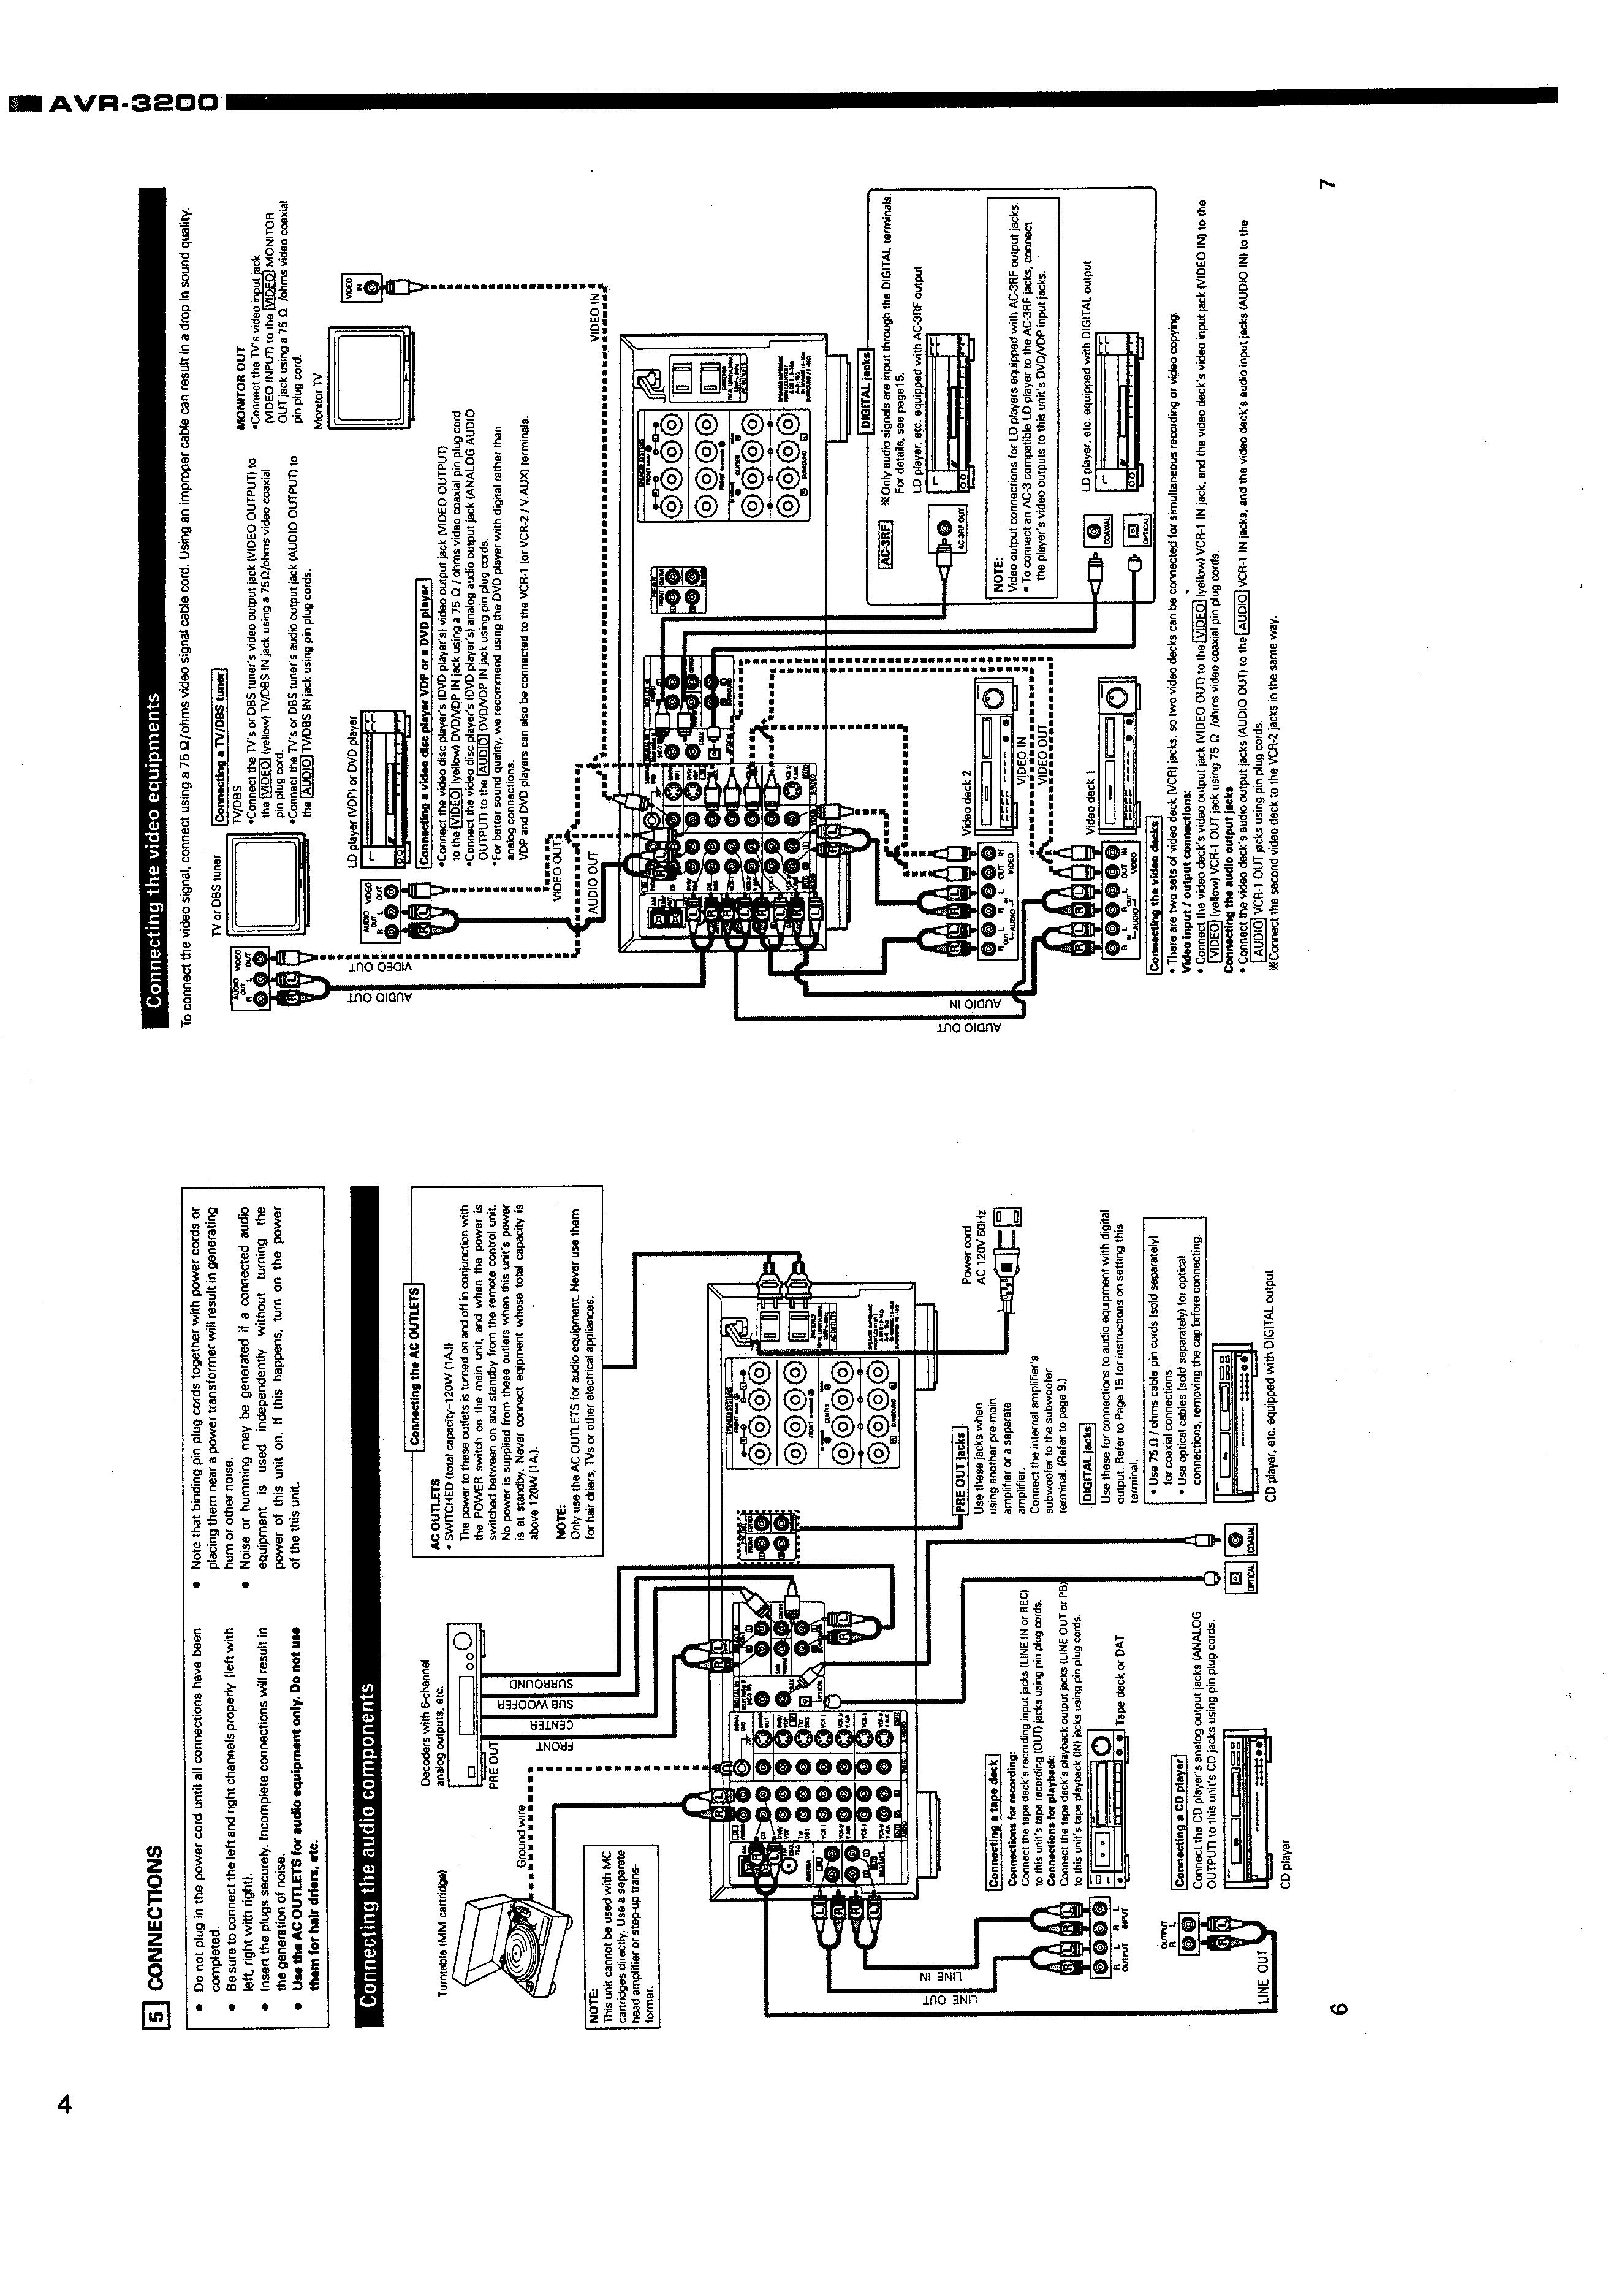 service manual for denon avr-3200